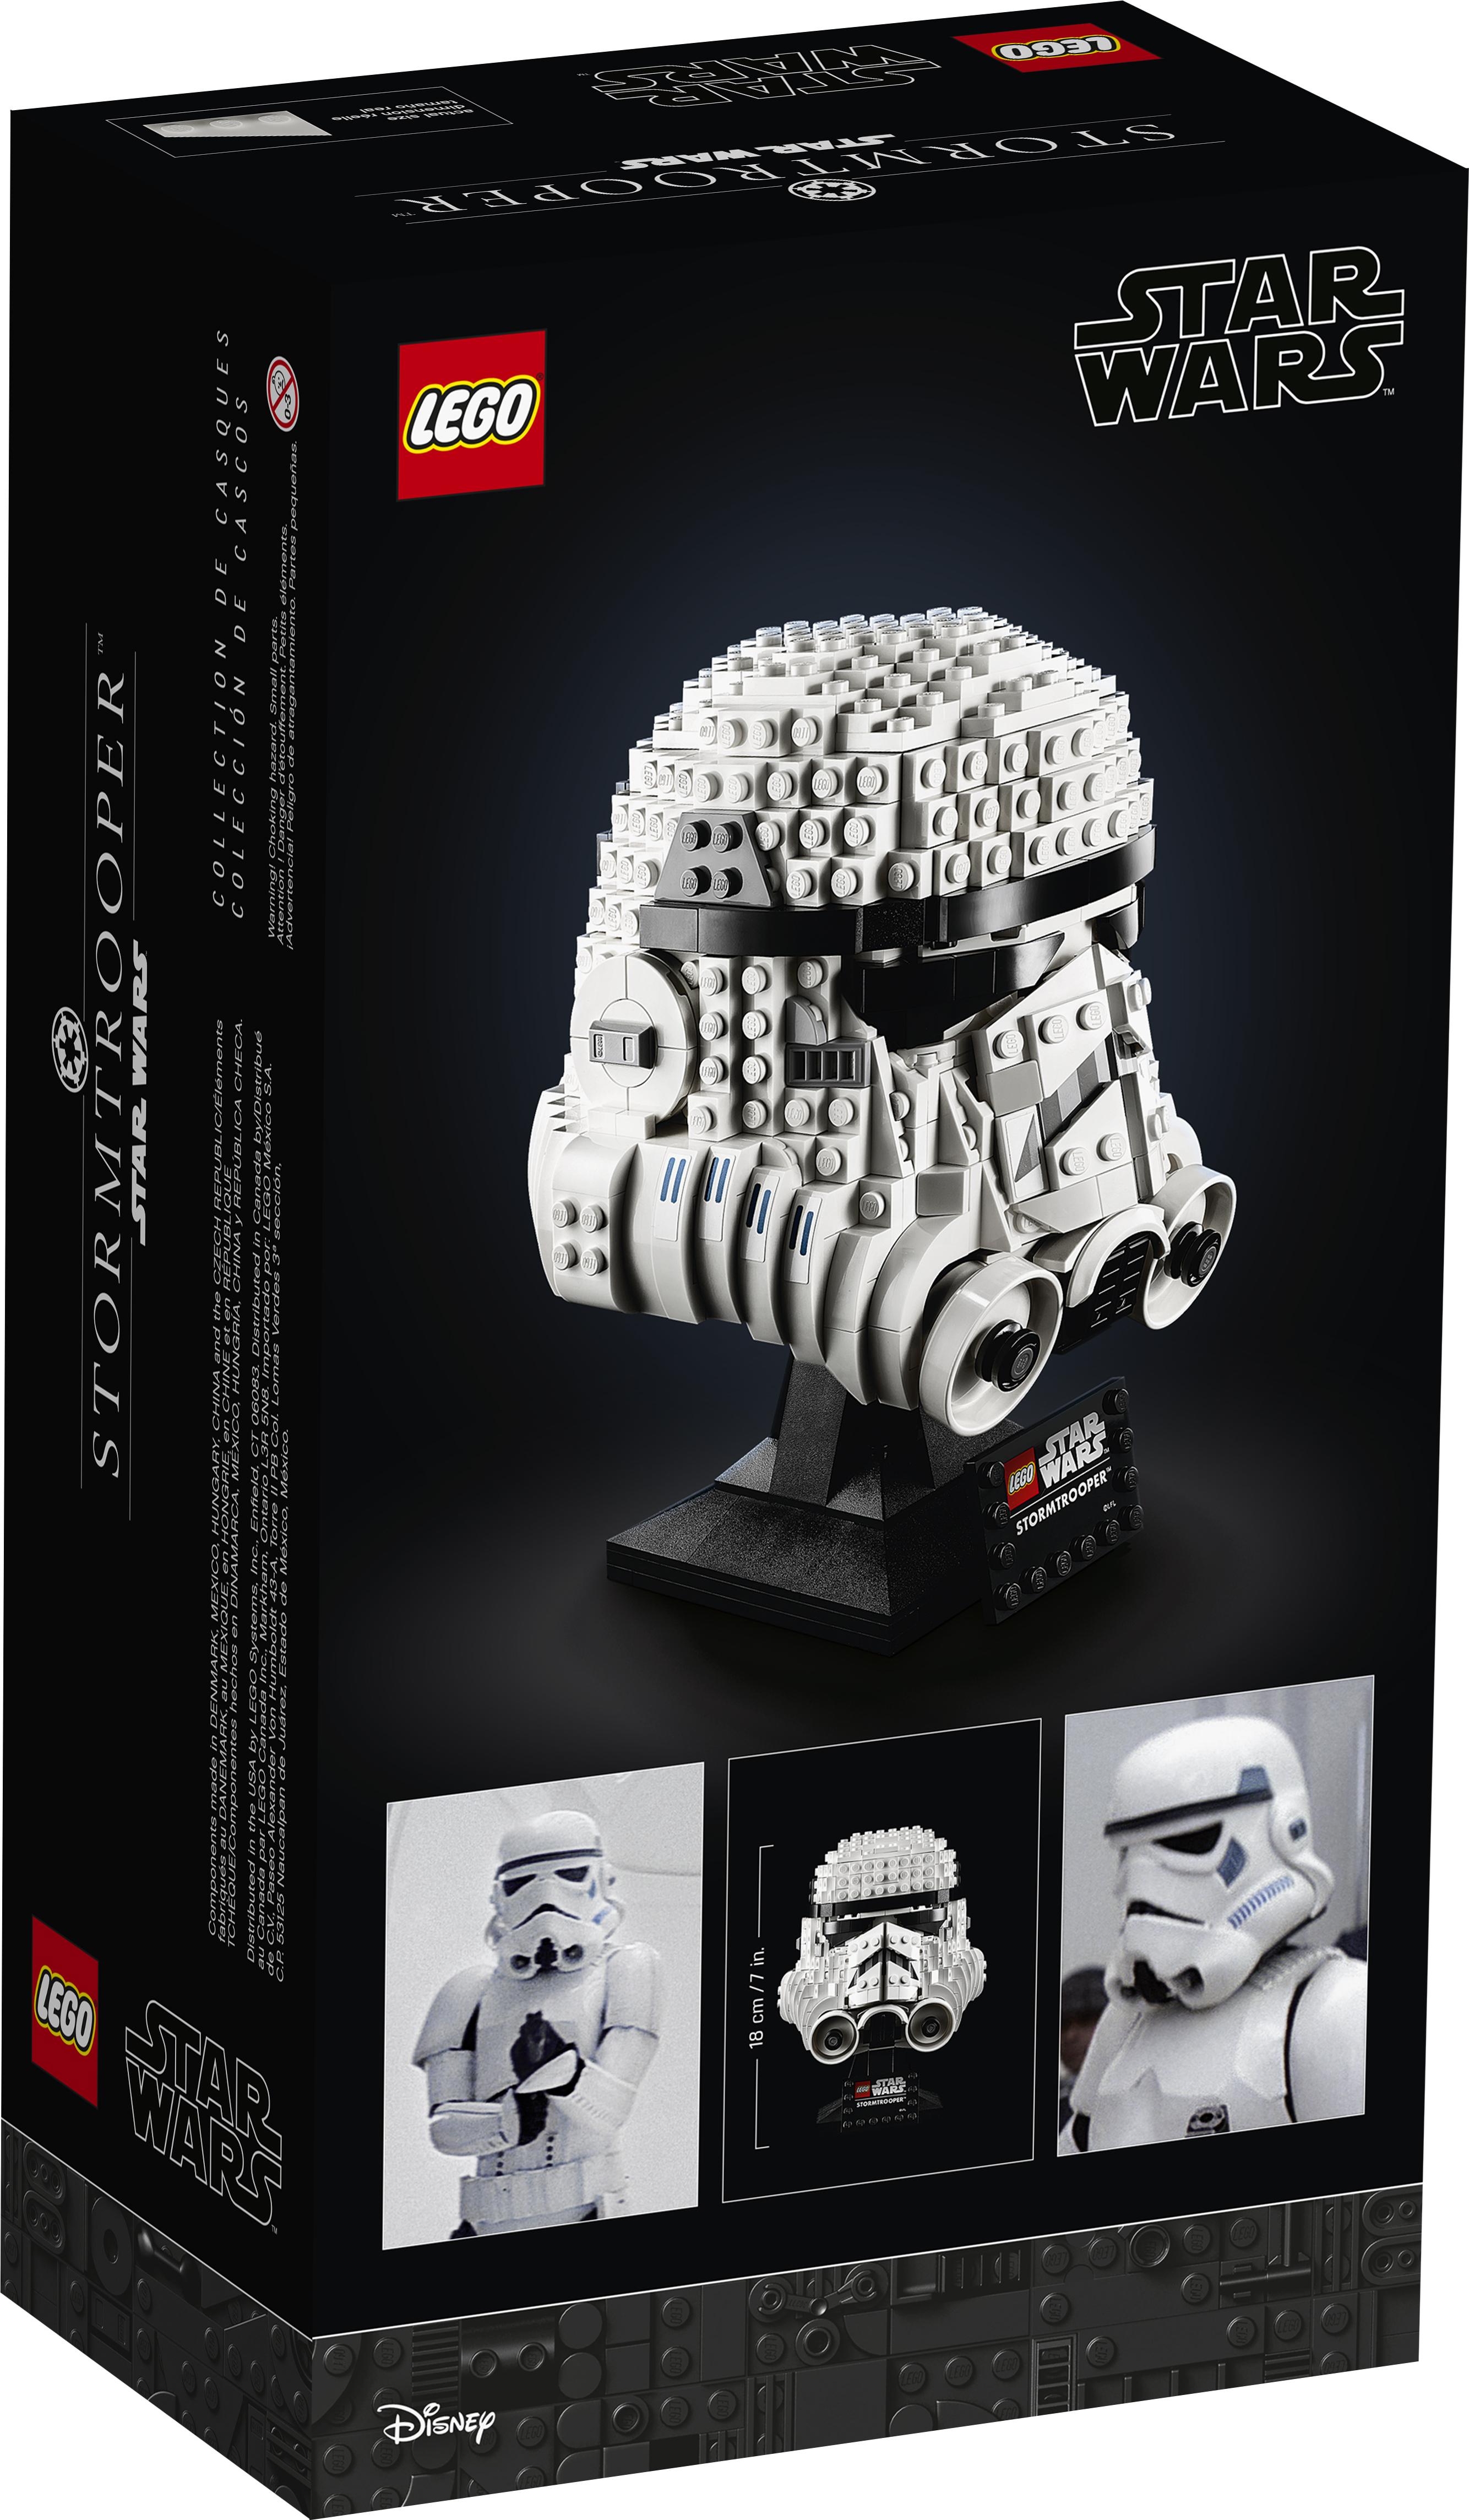 SW Imperial Stormtrooper Helmet Lego Set 2